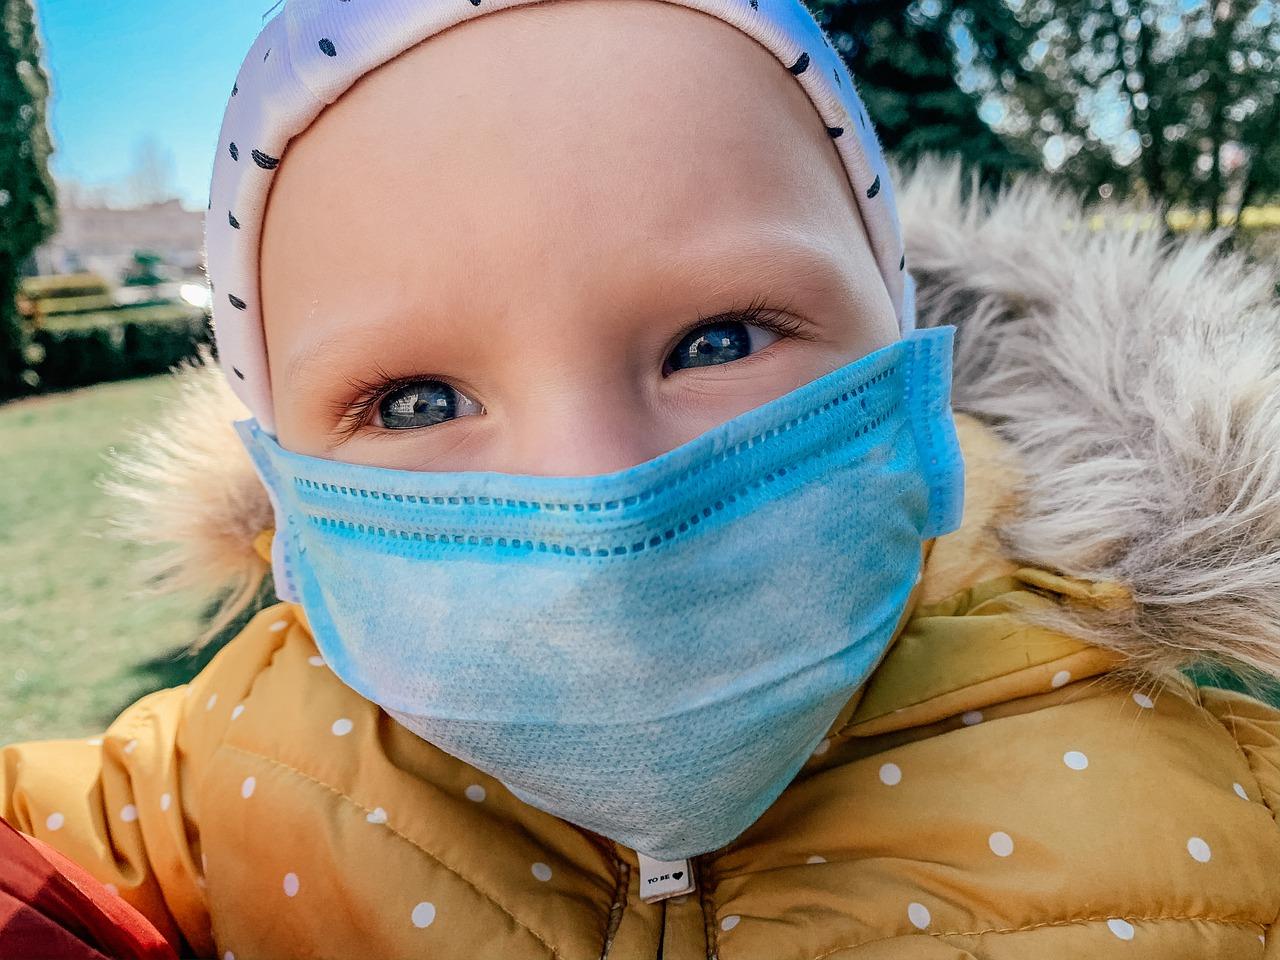 Il Coronavirus nei bambini